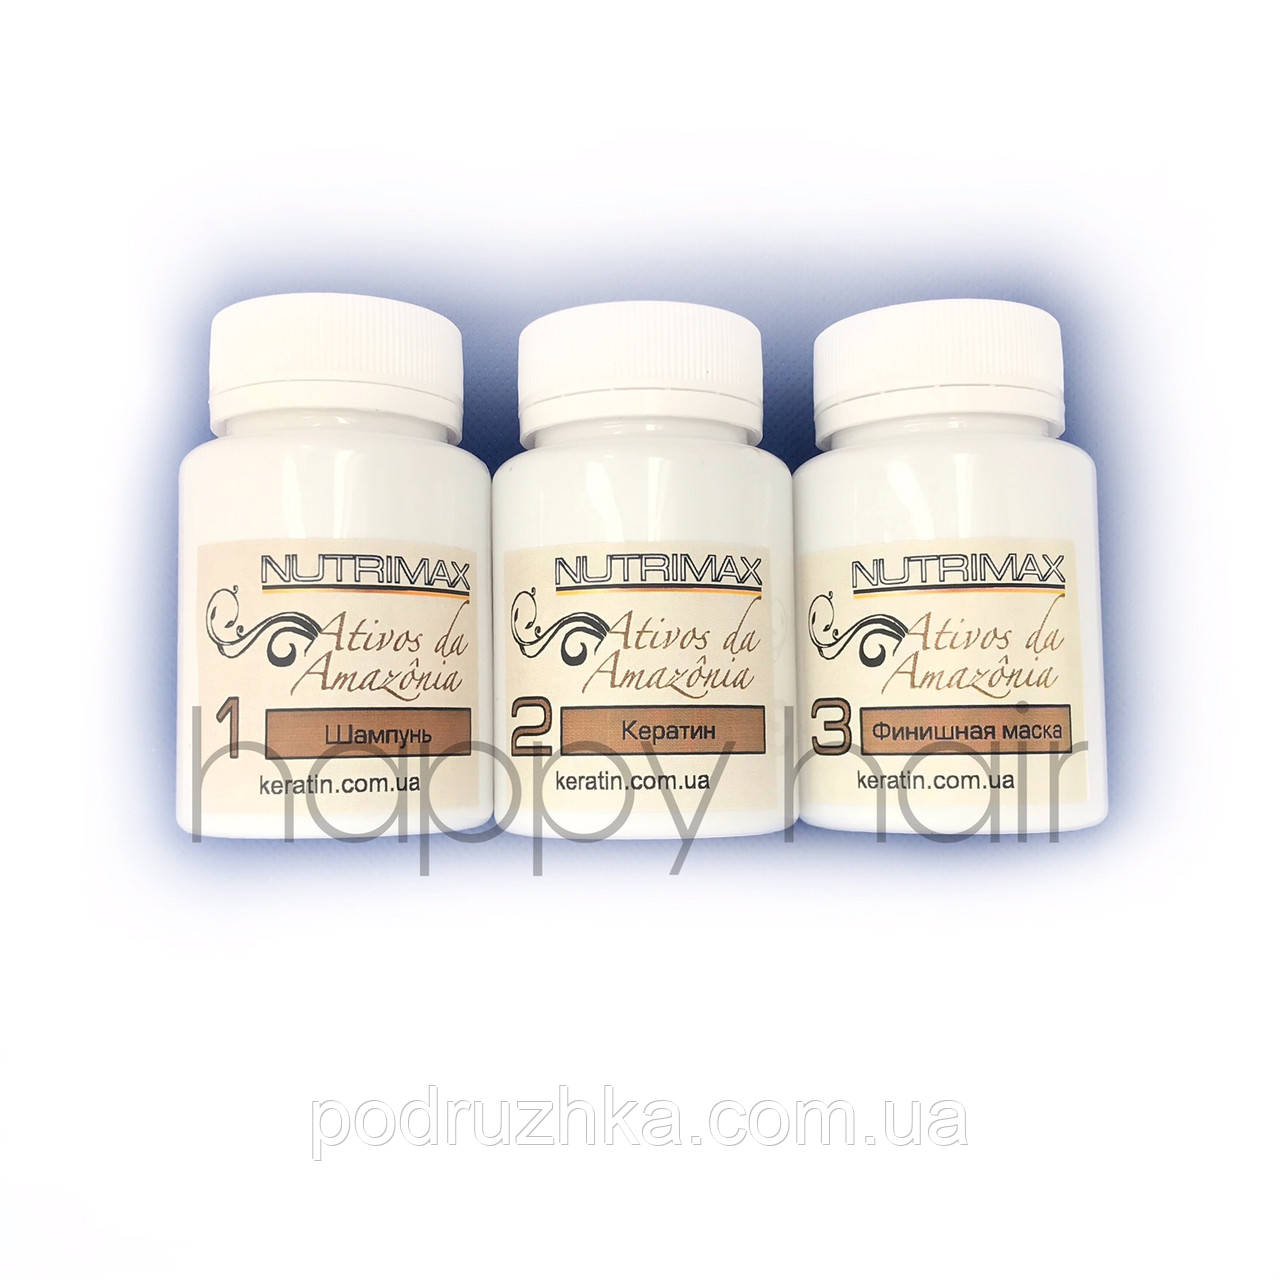 Nutrimax Soller Kit Набор кератина для волос 3x200 г